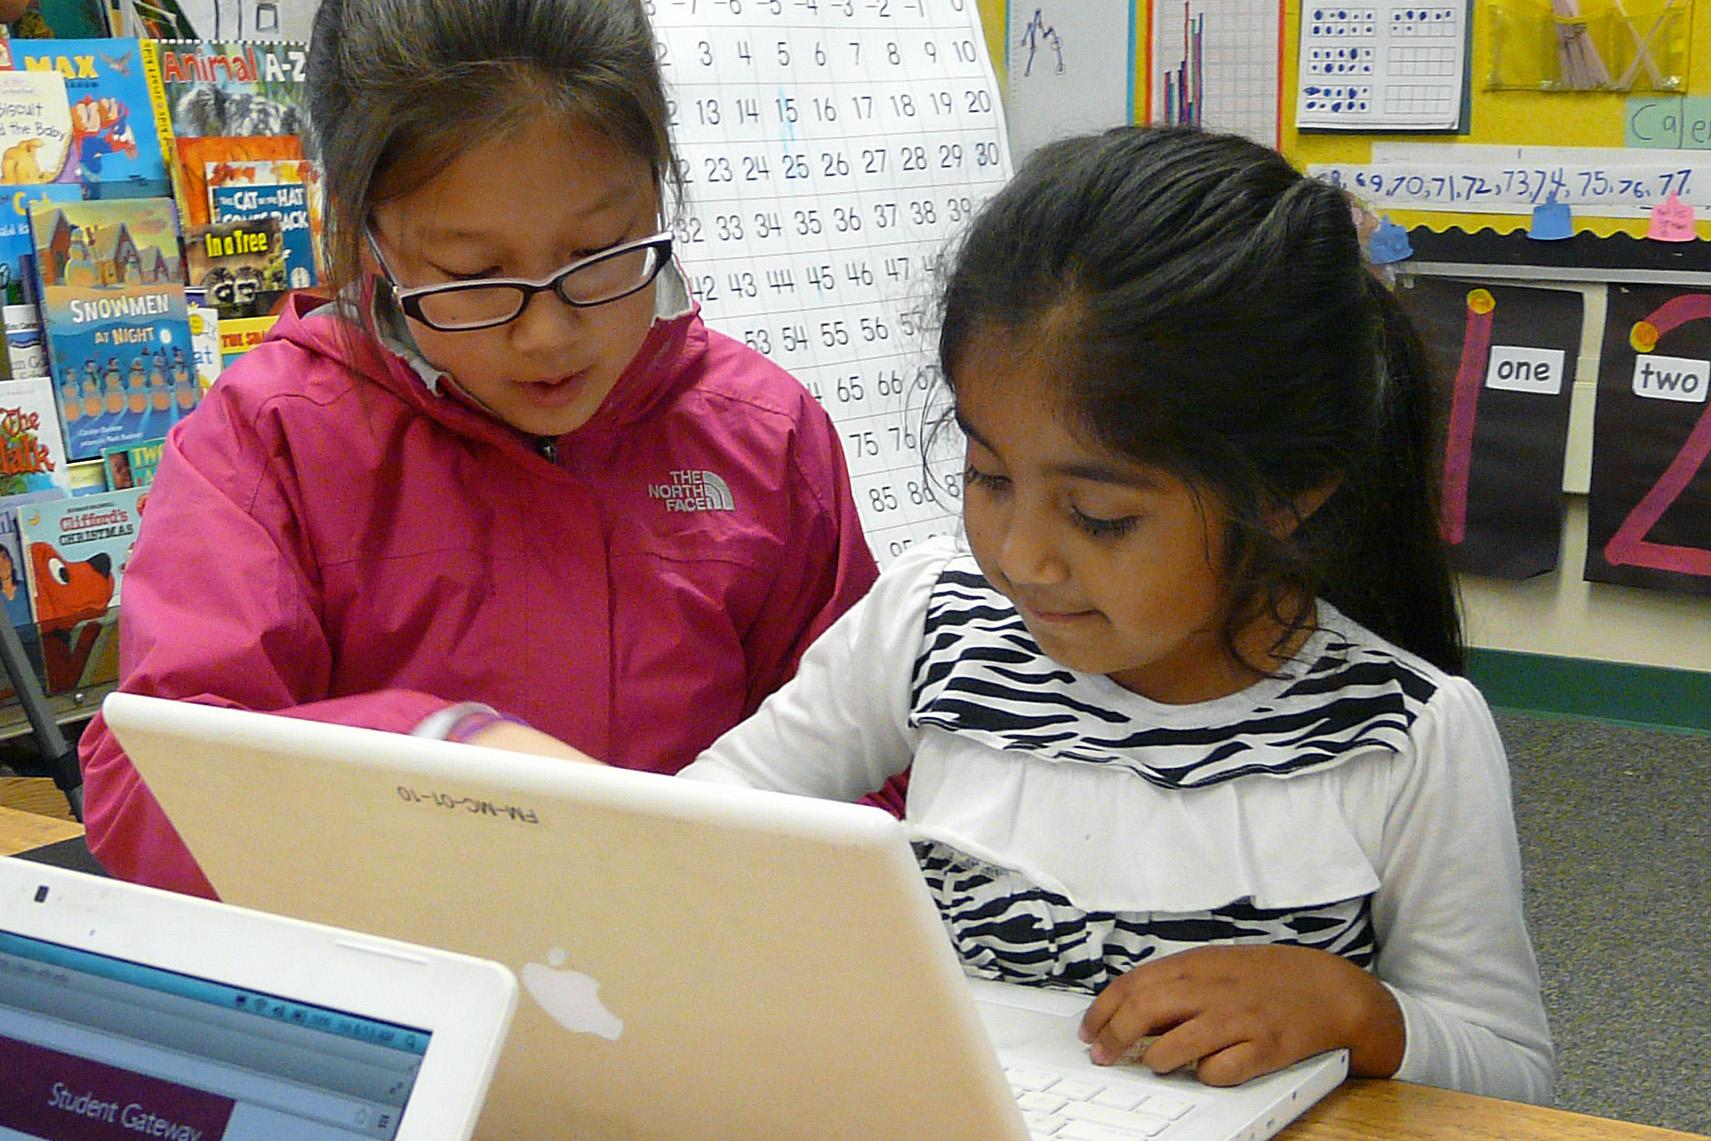 Tynker Hour of Code 5th graders teach Kinder